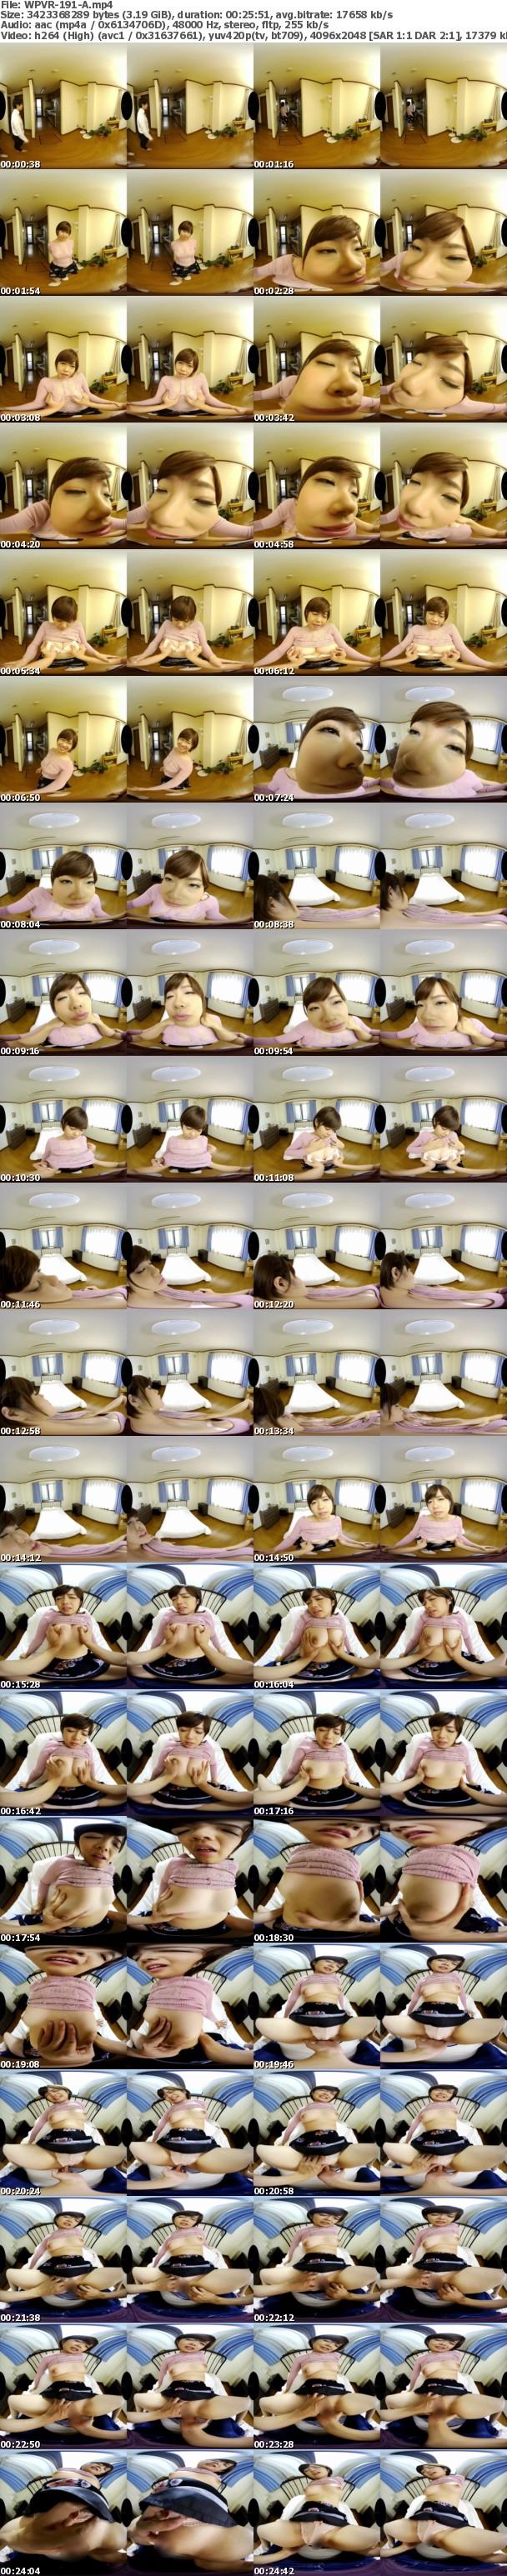 (VR) WPVR-191 モデルルームで敏感ボインな婚約者と声ガマン性交…でも見学中に生はマズくない? 赤瀬尚子